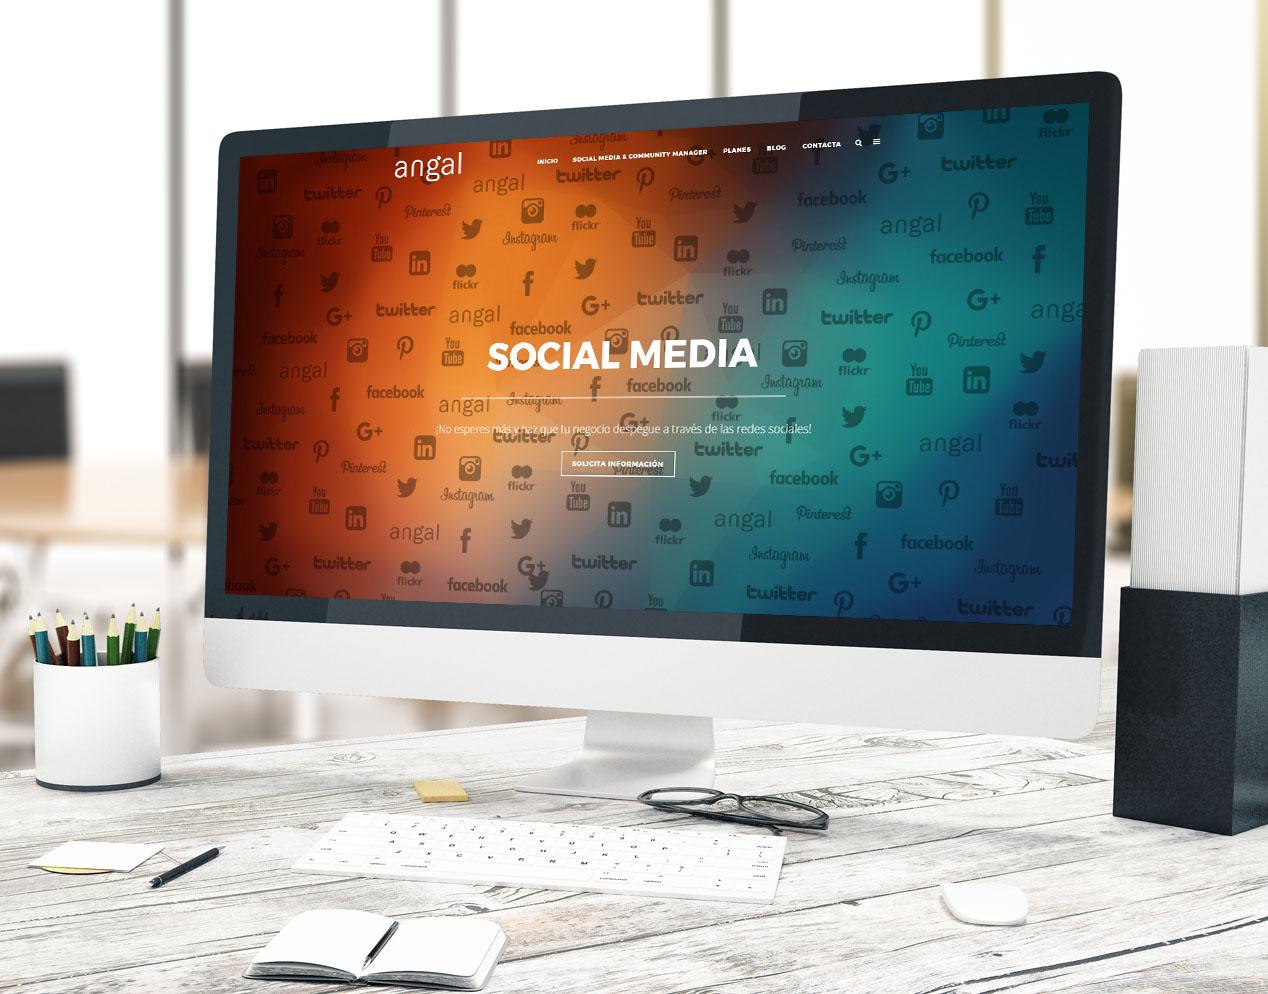 Agencia de marketing digital